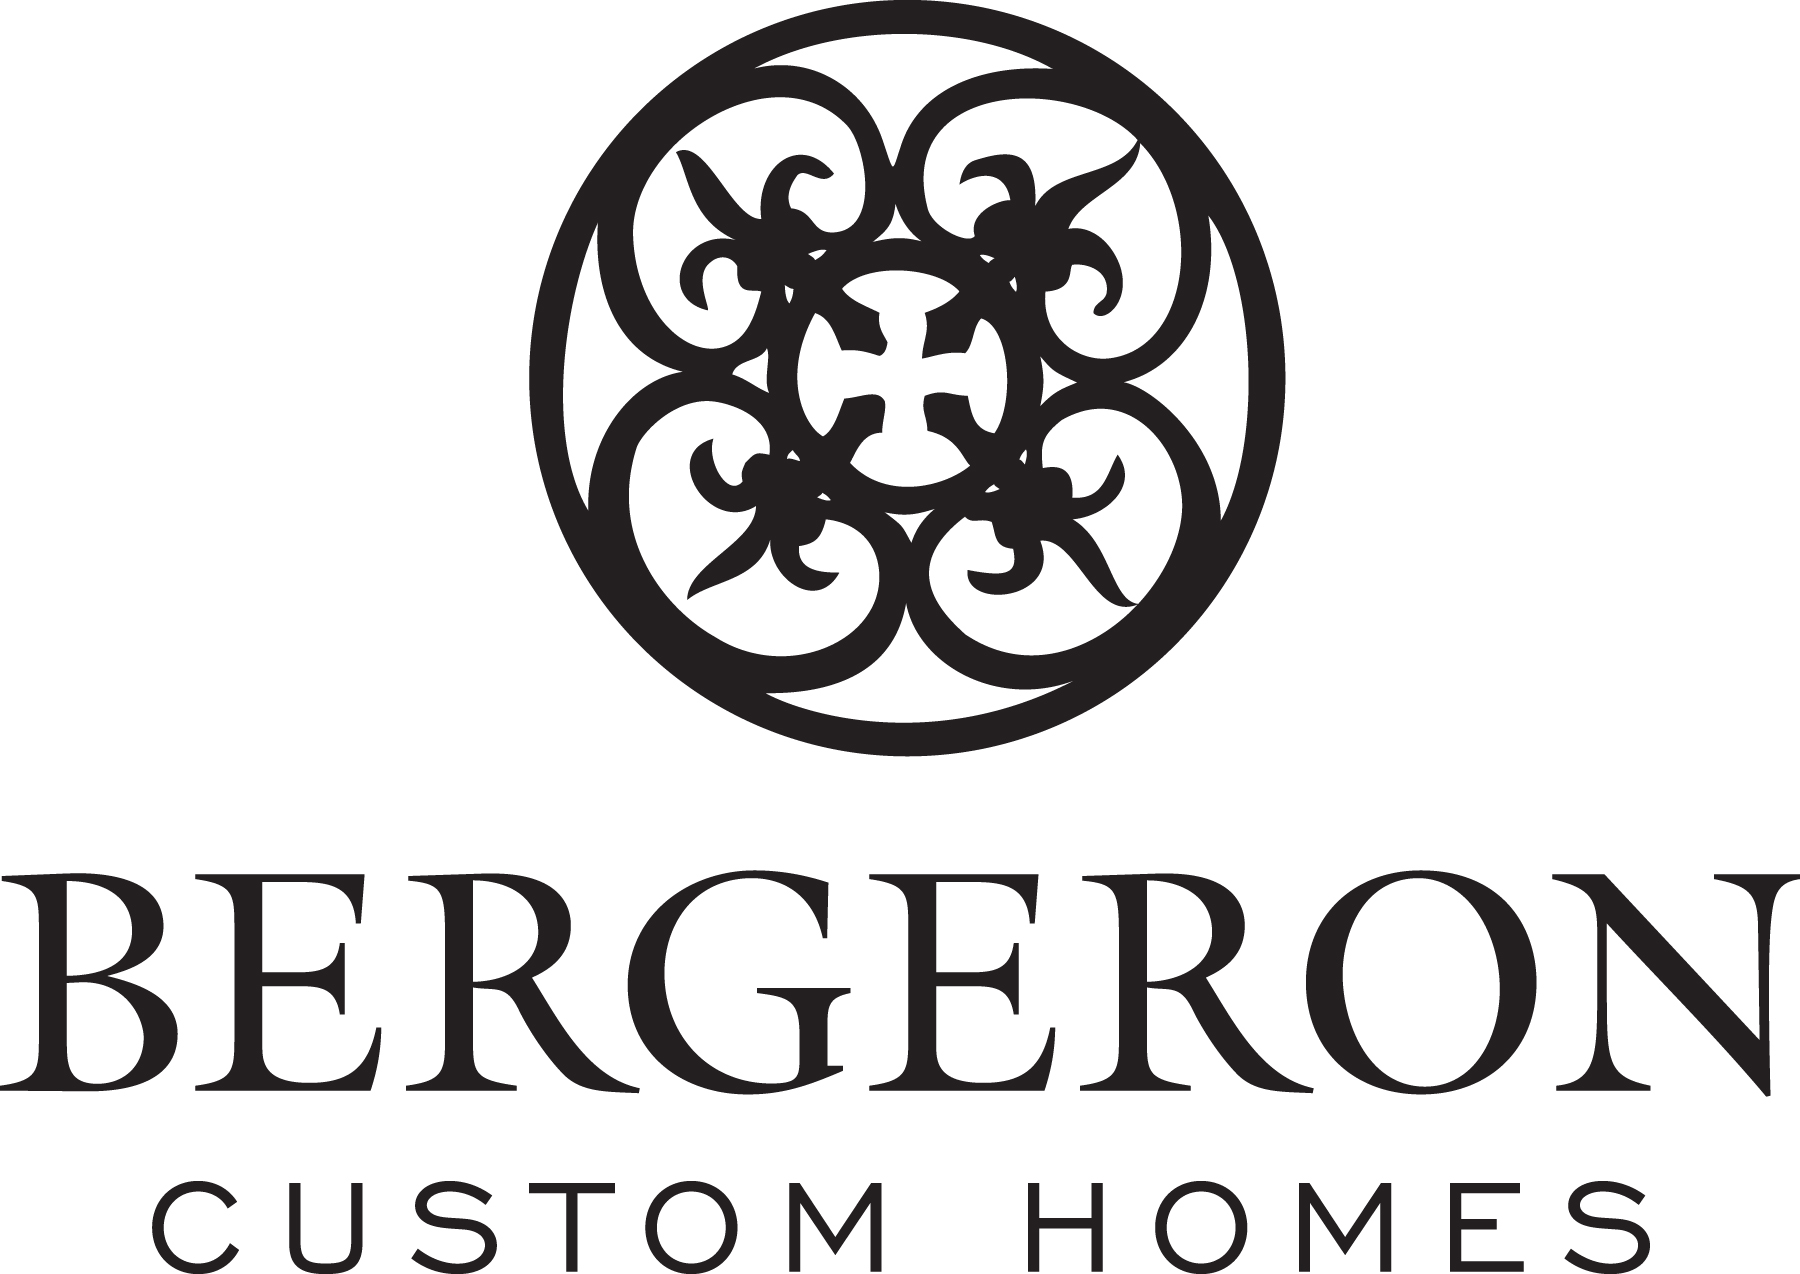 Bergeron Cusotm Homes Logo.jpg